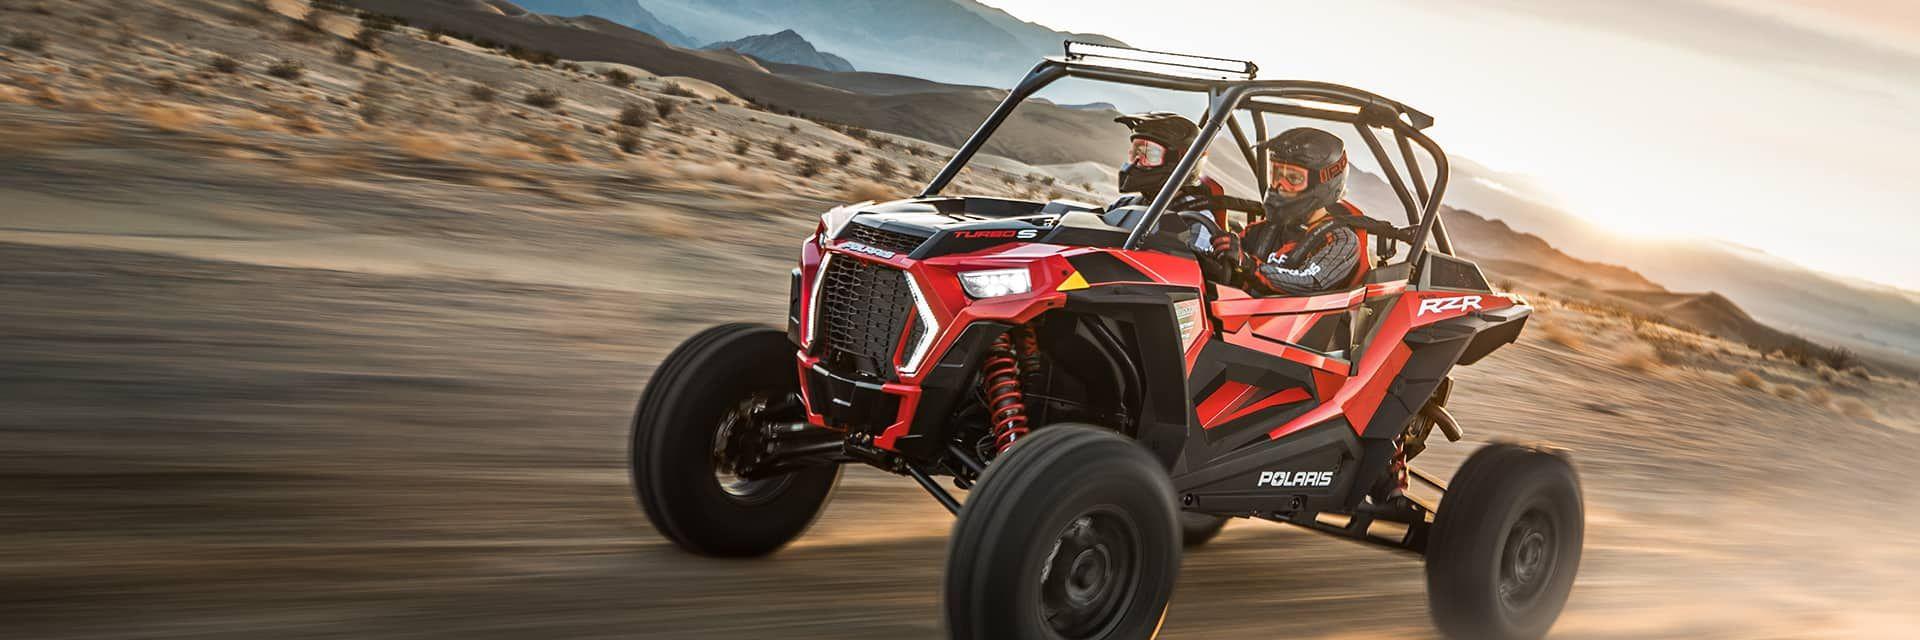 Shop for Polaris RZR XP Turbo at Jan-Cen Motor Sports